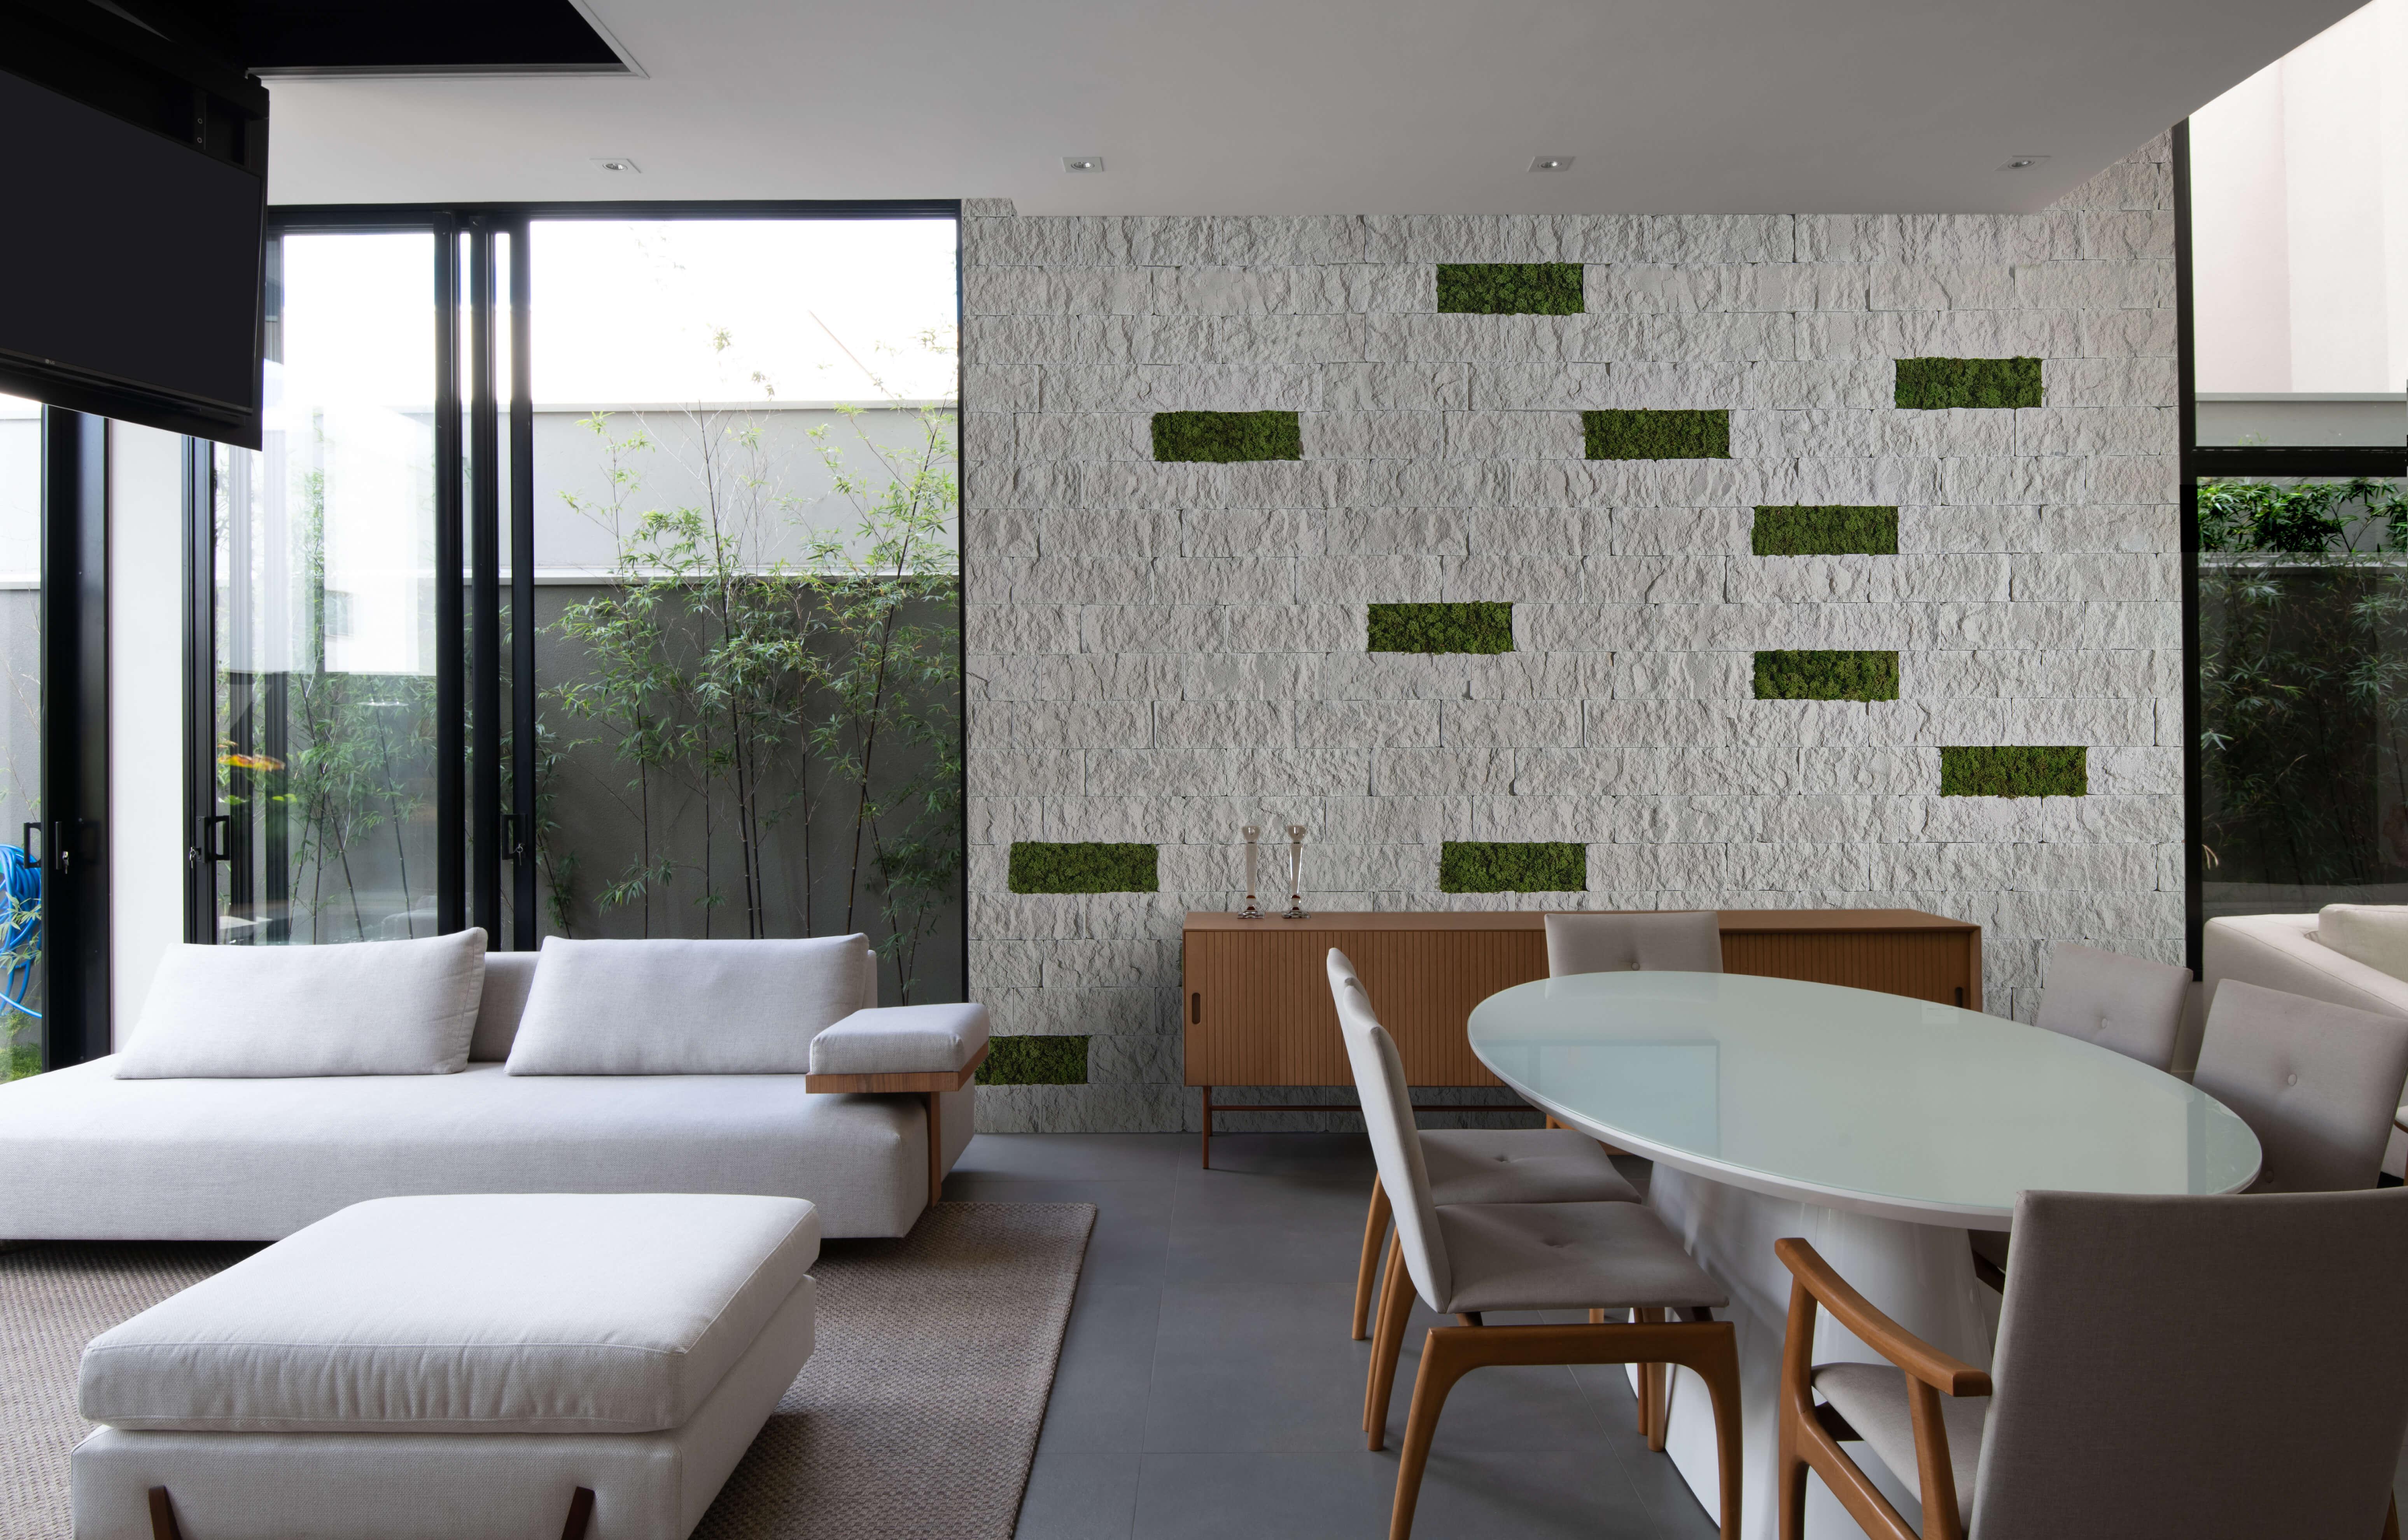 Ecobrick Stone Marfim - Moss verde bosque - Arq. Andre Zazeri - Foto Favaro Jr.